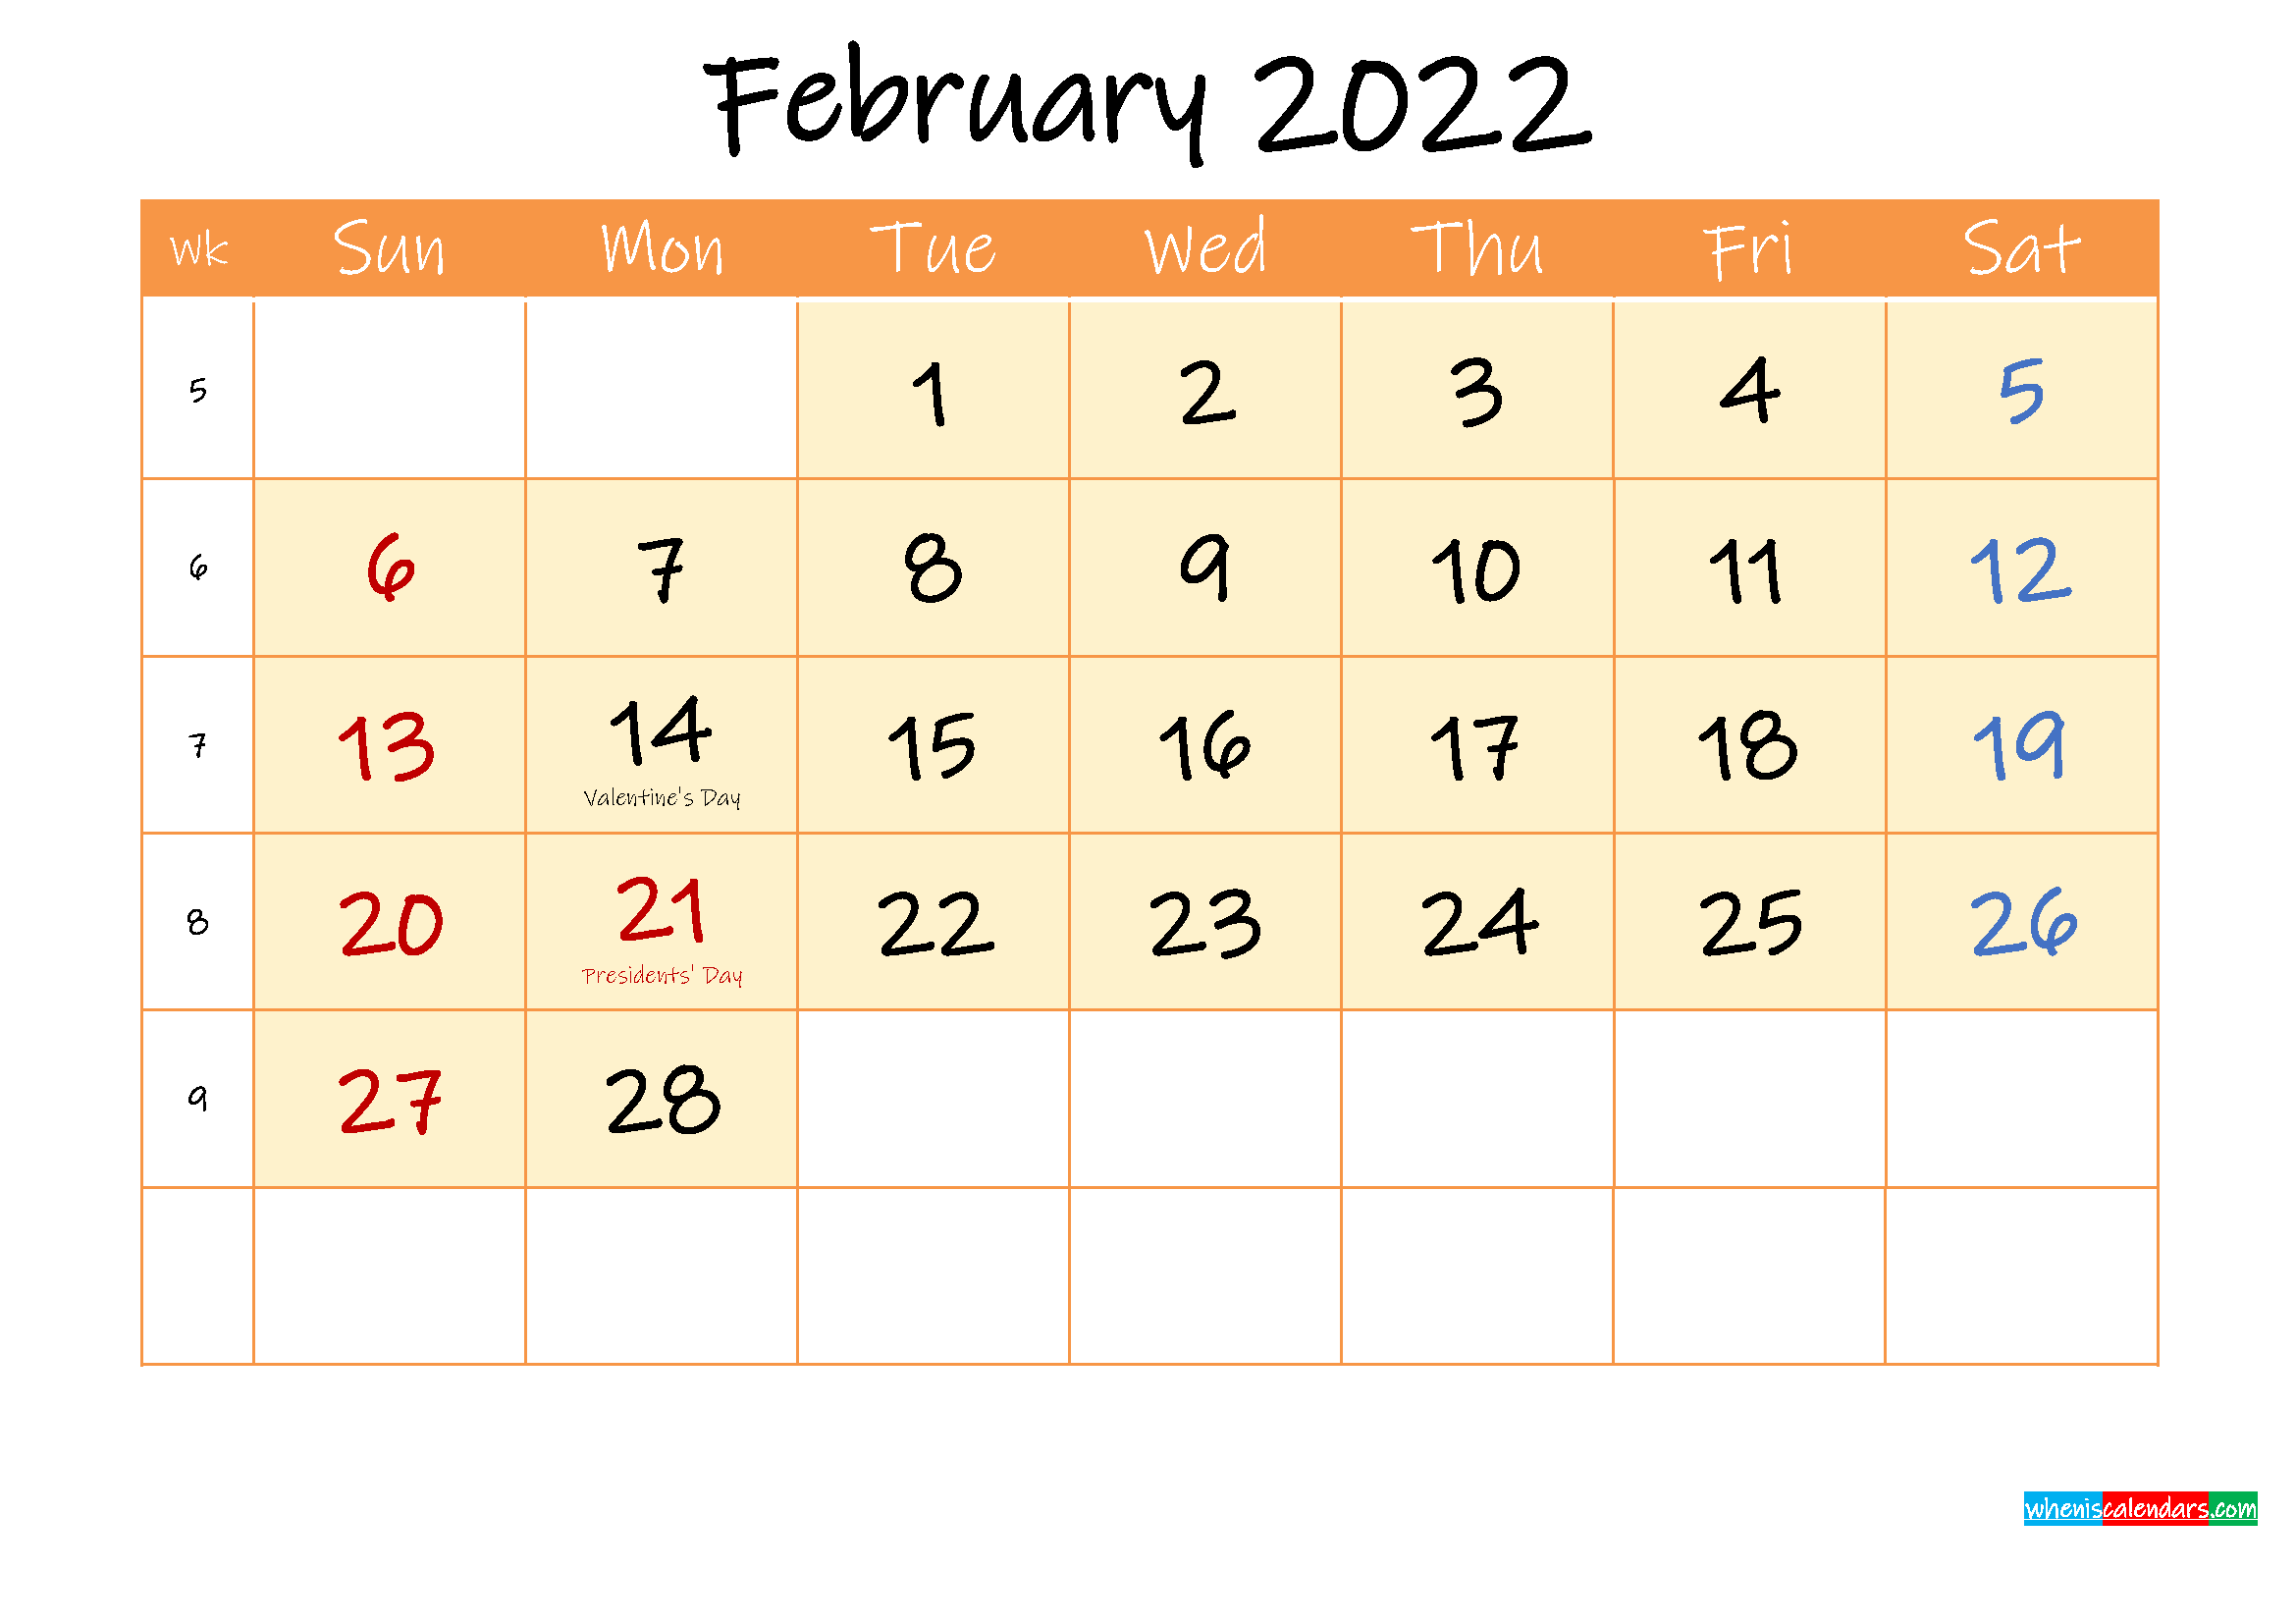 February 2022 Free Printable Calendar – Template Ink22M158 Throughout Feb 2022 Calendar Template